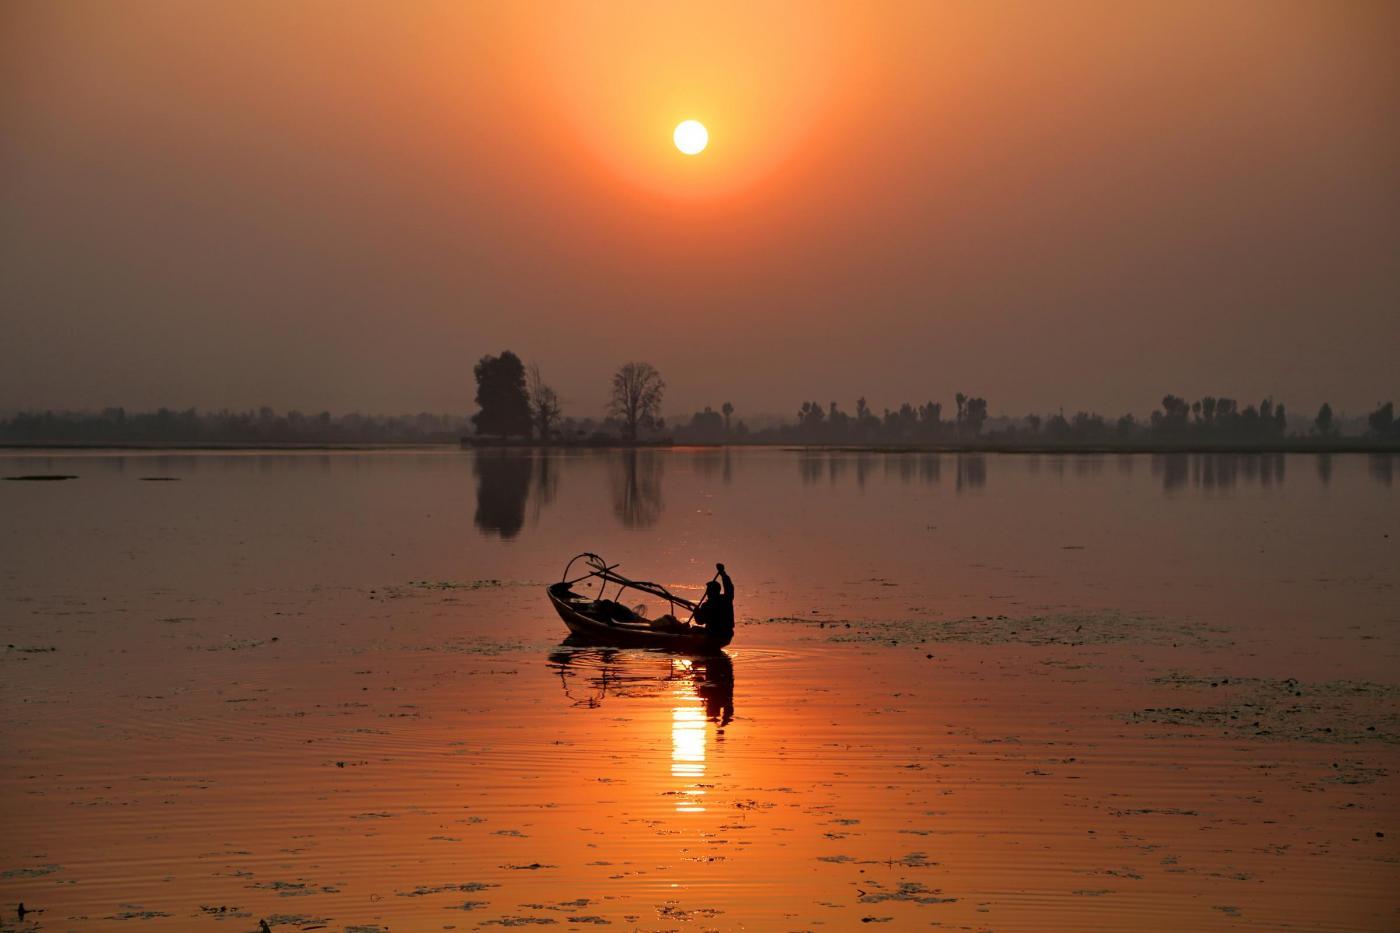 (171030) -- SRINAGAR, Oct. 30, 2017 (Xinhua) -- A fisherman rows his boat in Dal Lake at sunset, in Srinagar, summer capital of Indian-controlled Kashmir, Oct. 30, 2017. (Xinhua/Javed Dar) (lrz)